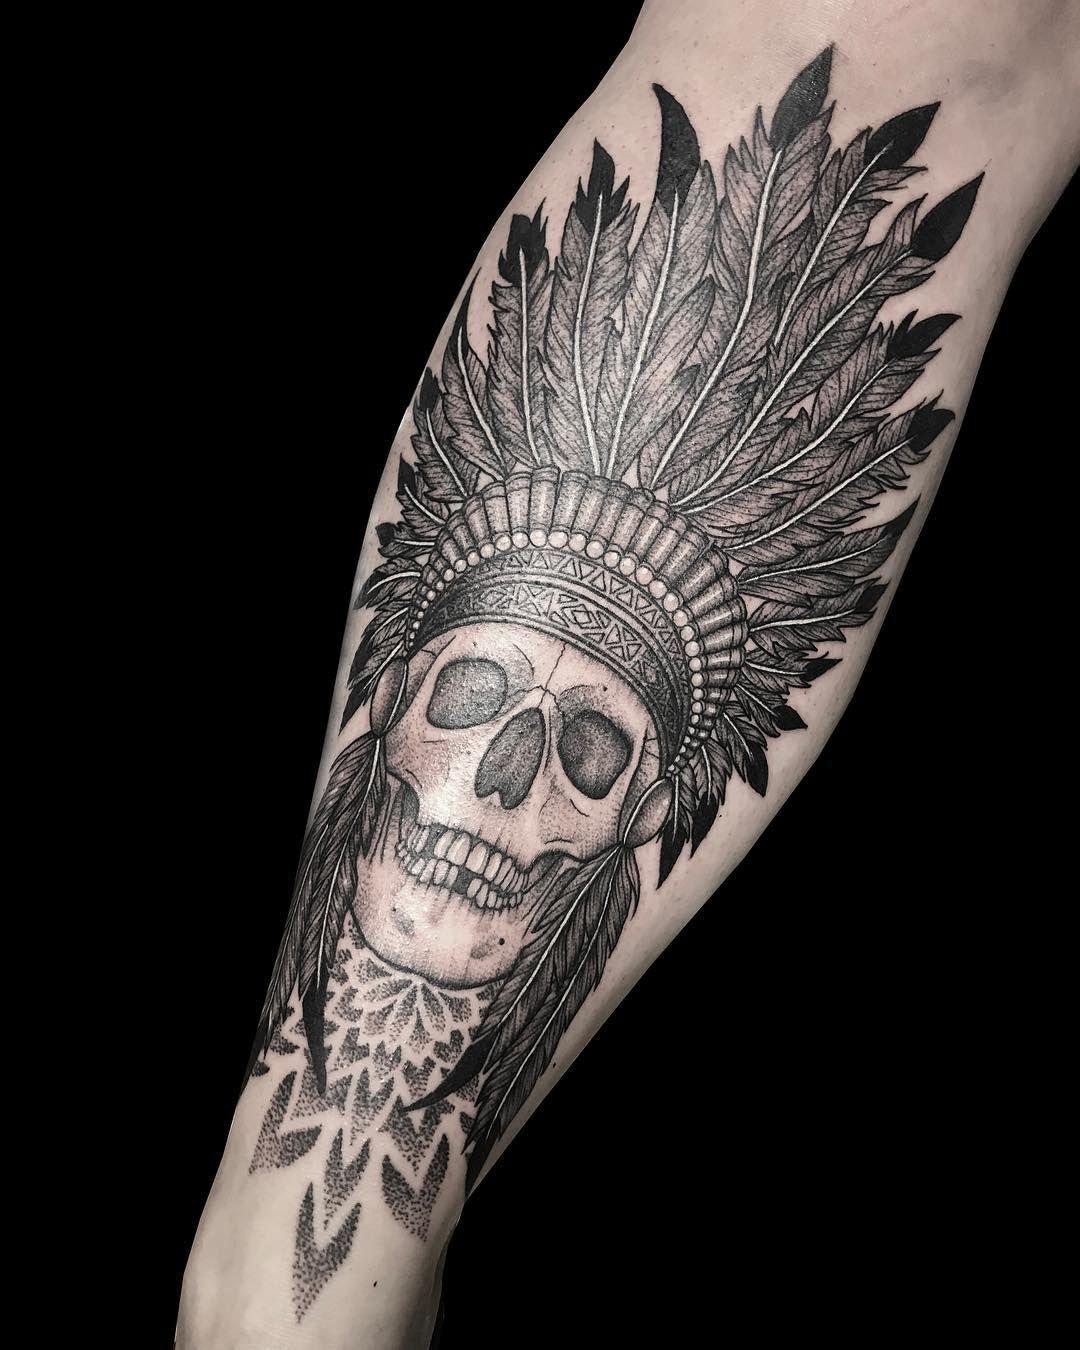 The Monumental Ink Tattoo Artists Indian skull tattoos